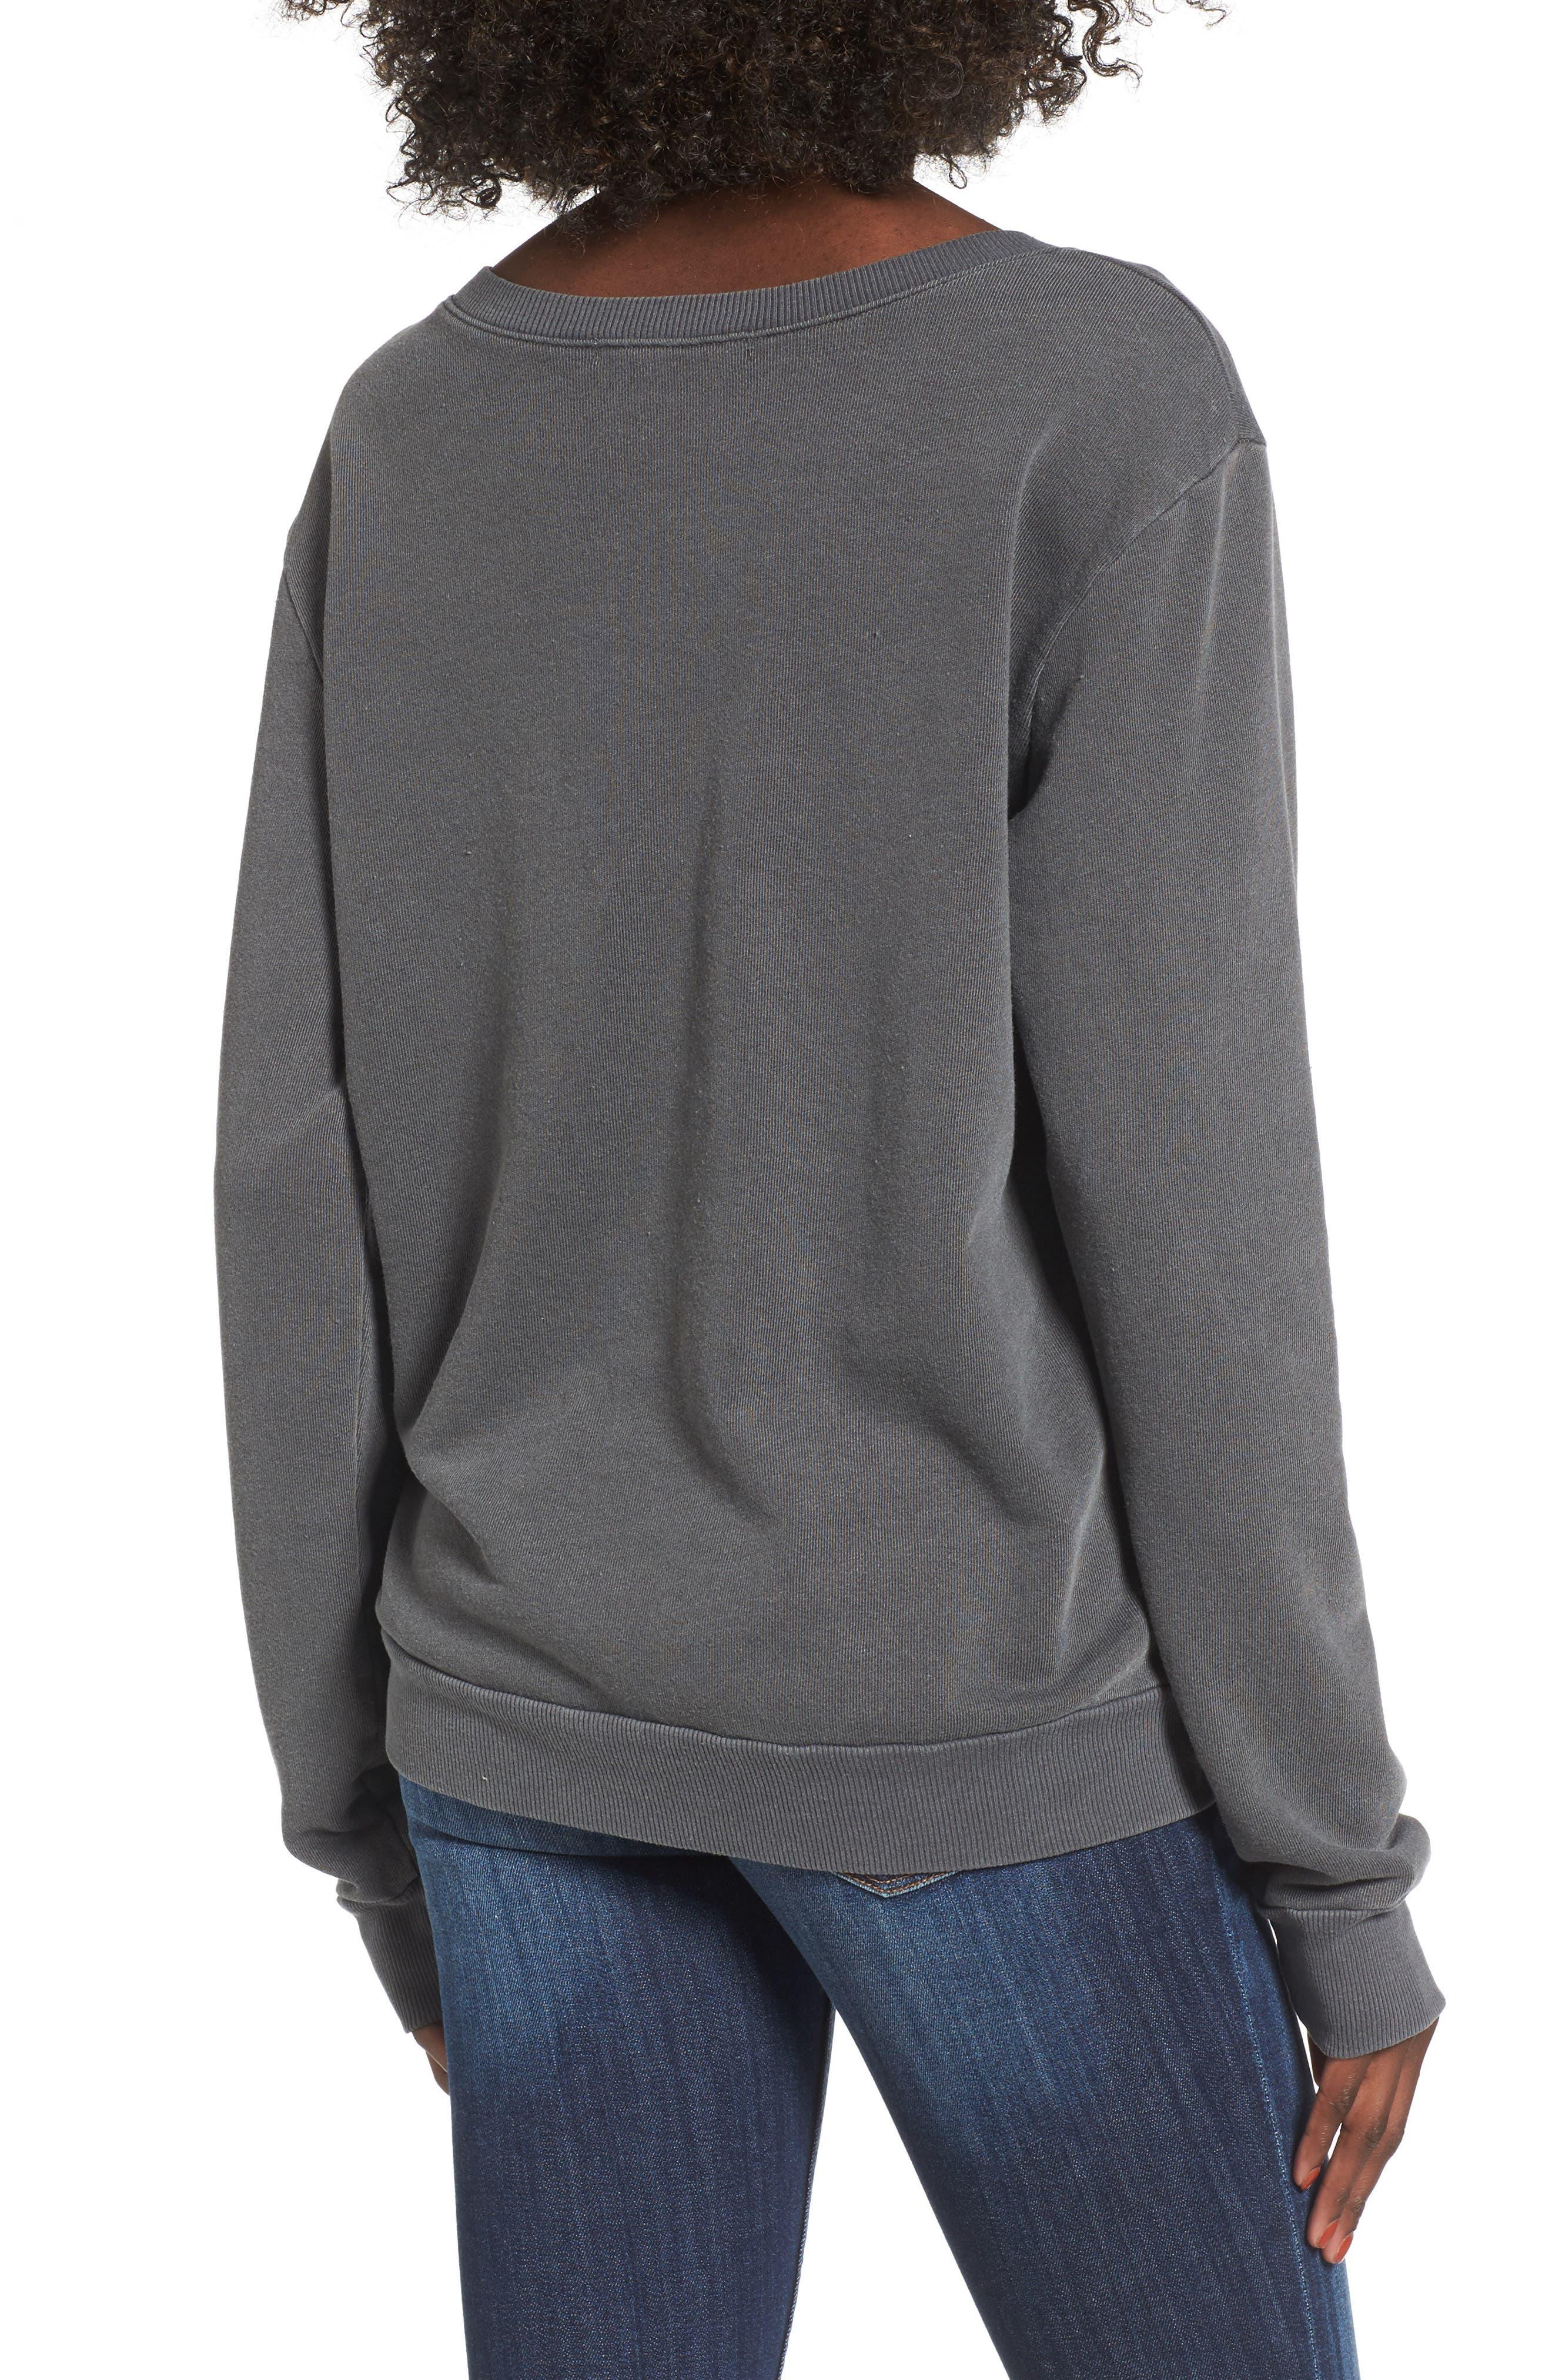 Def Leppard Sweatshirt,                             Alternate thumbnail 2, color,                             001